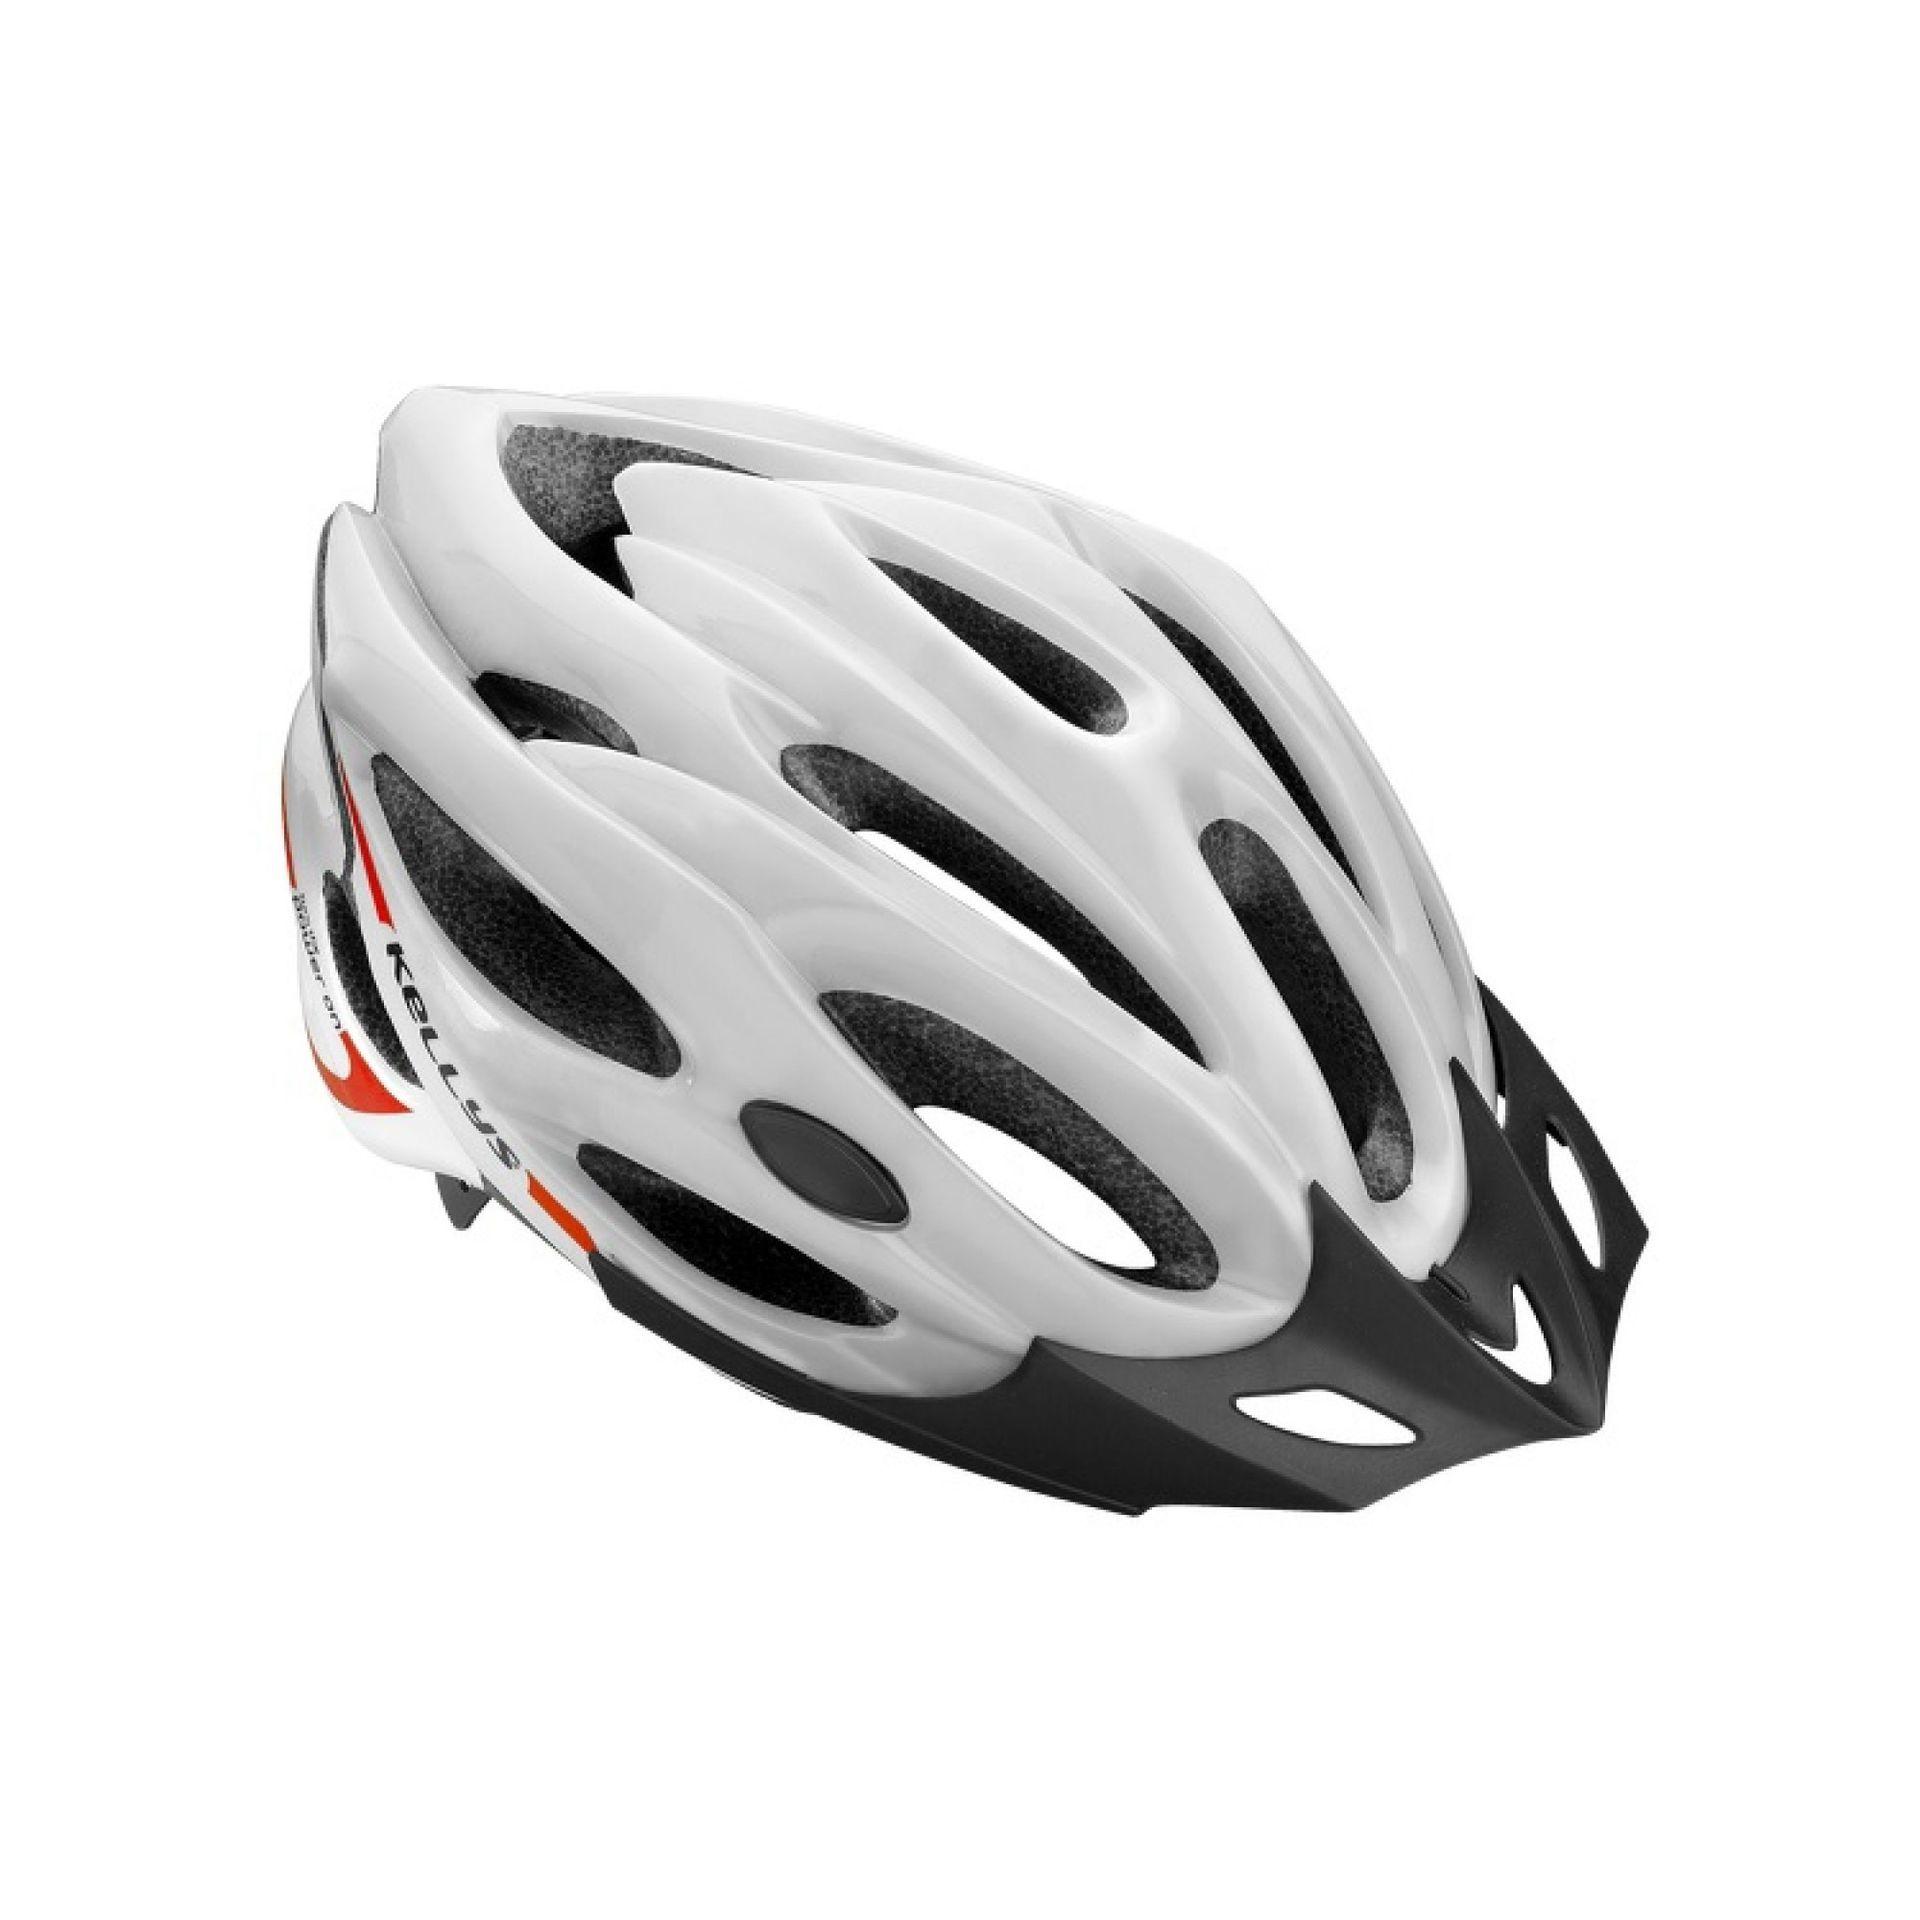 Kask rowerowy Kellys Spirit biały